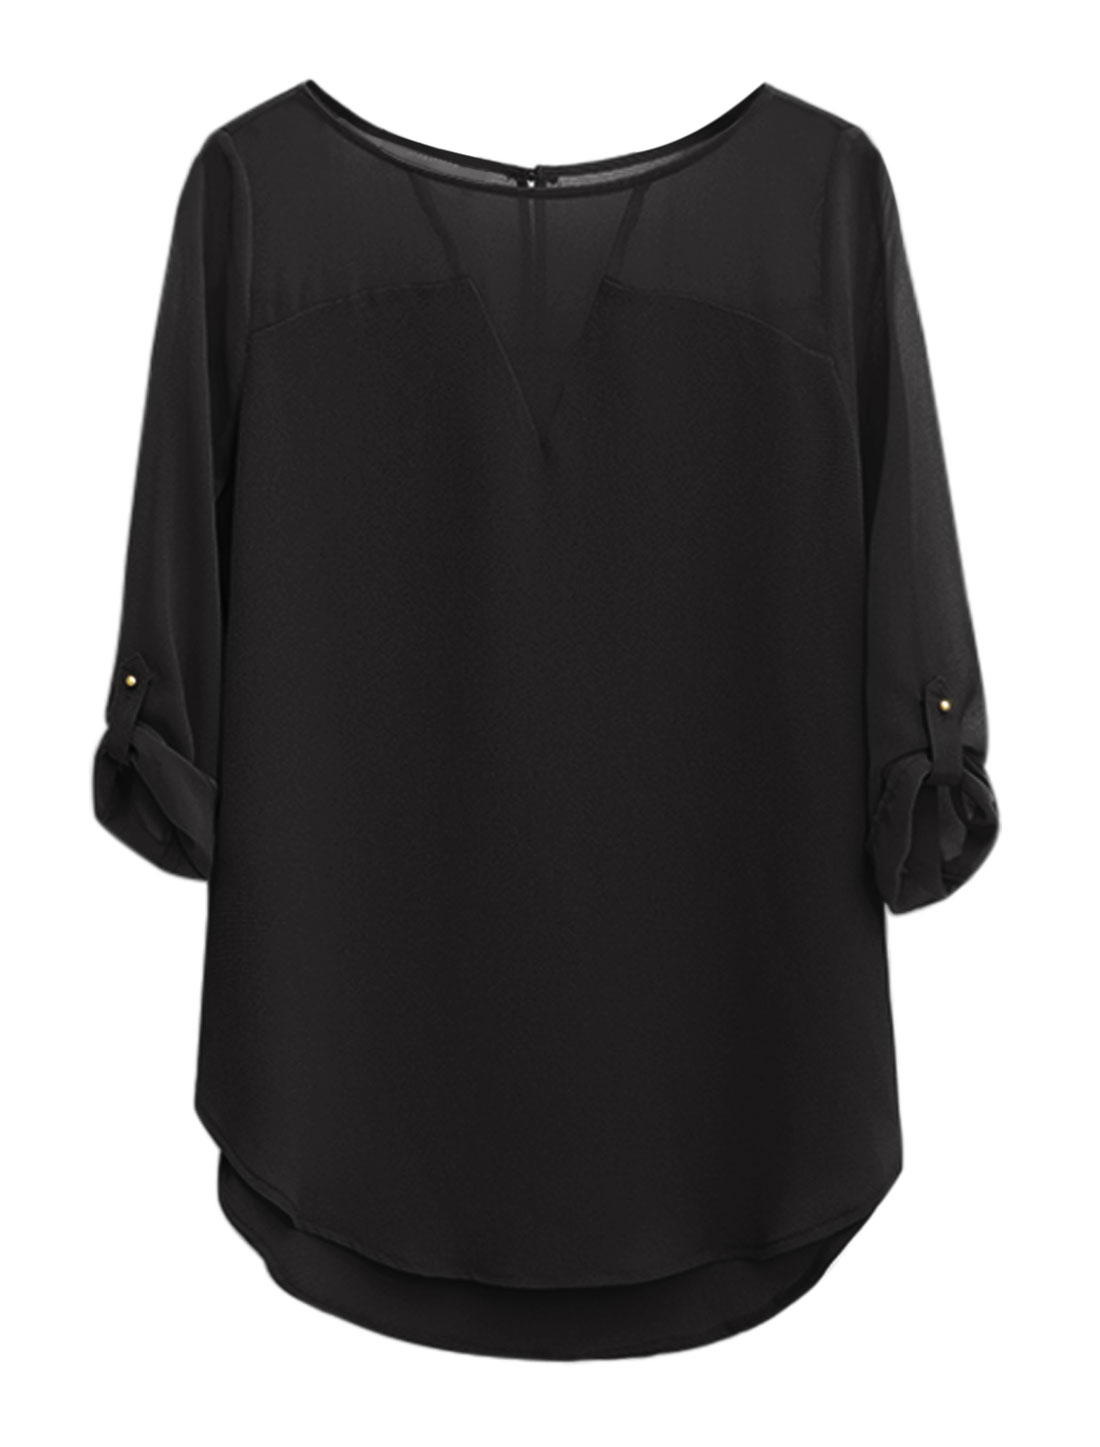 Women Roll Up Sleeves Round Hem Paneled Tunic Chiffon Top Black M